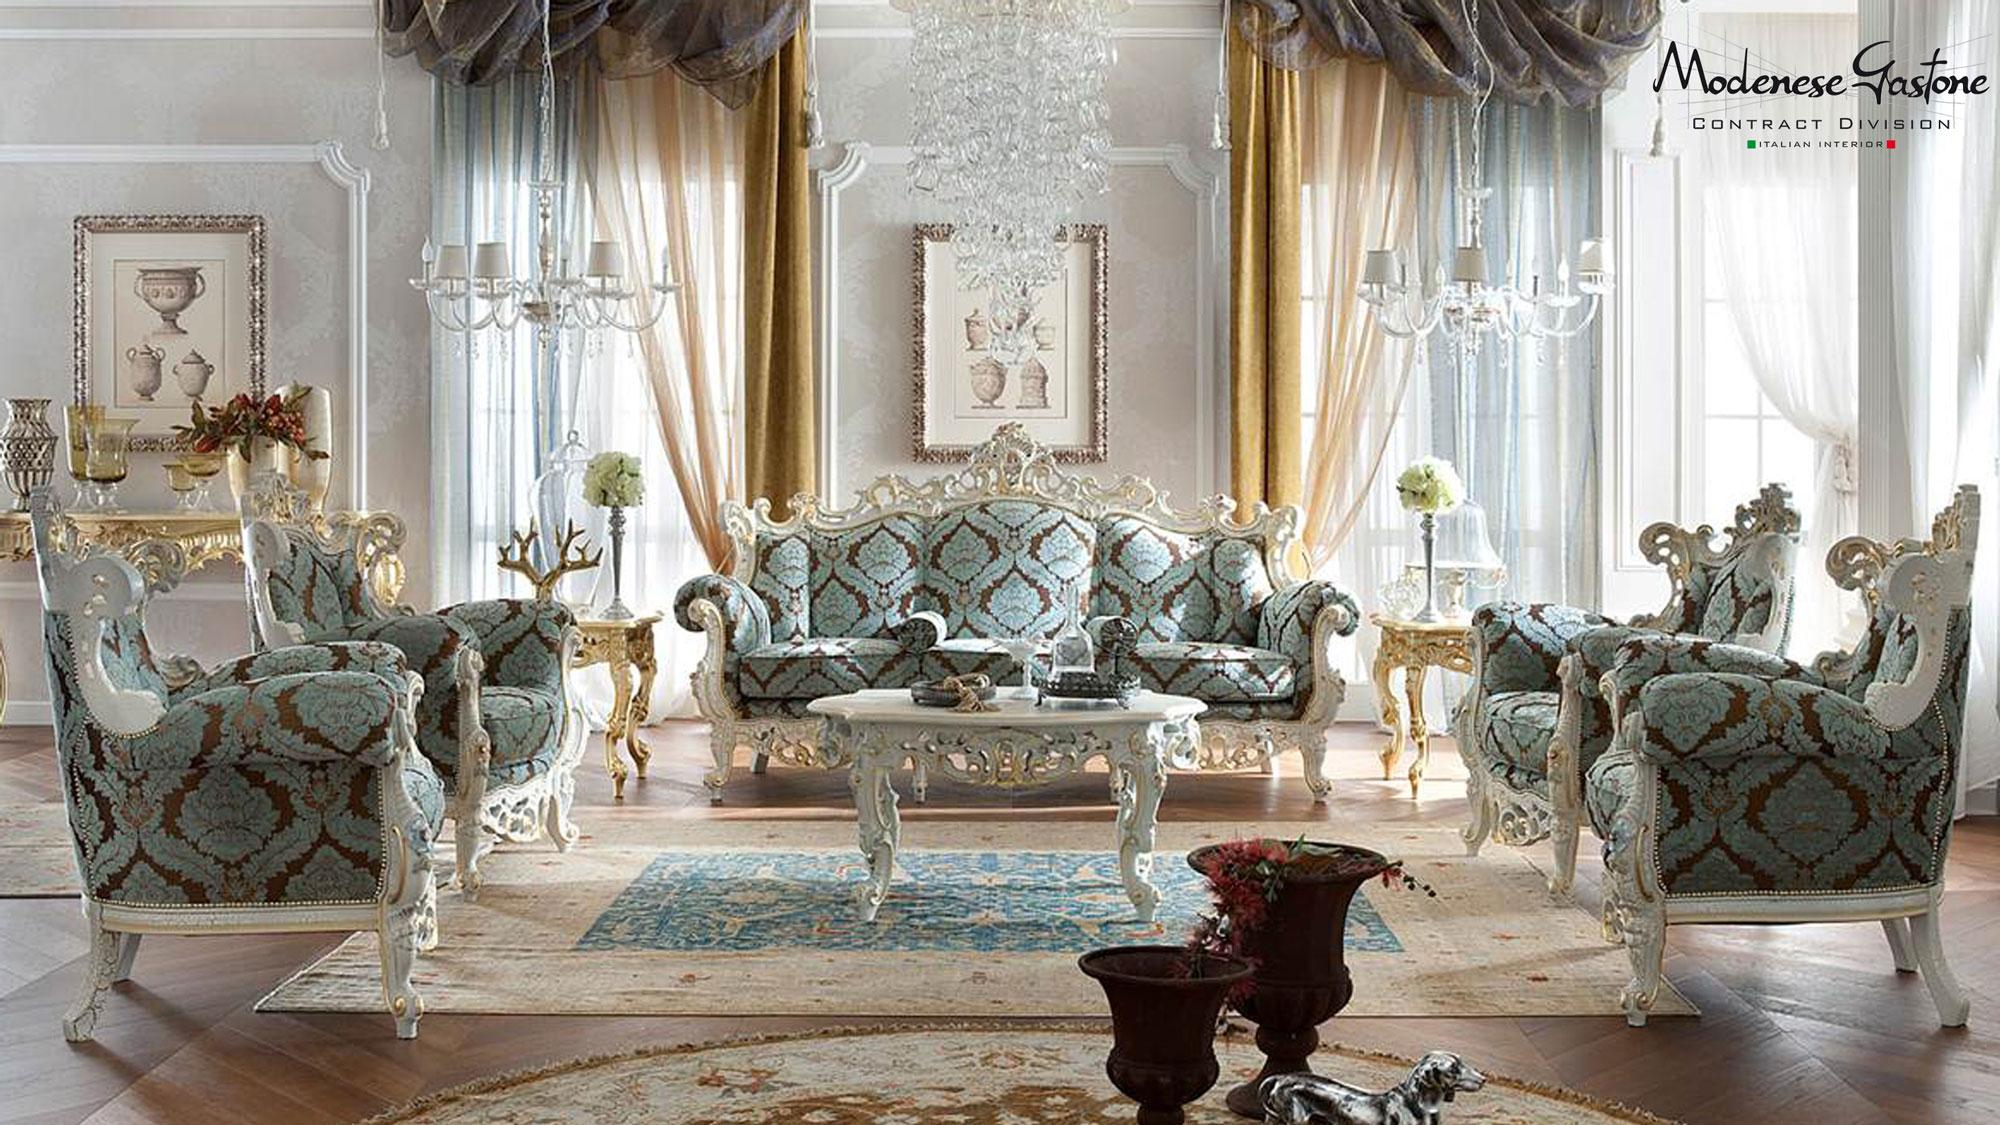 Baroque living room modenese gastone interiors s r l for Living estilo romantico